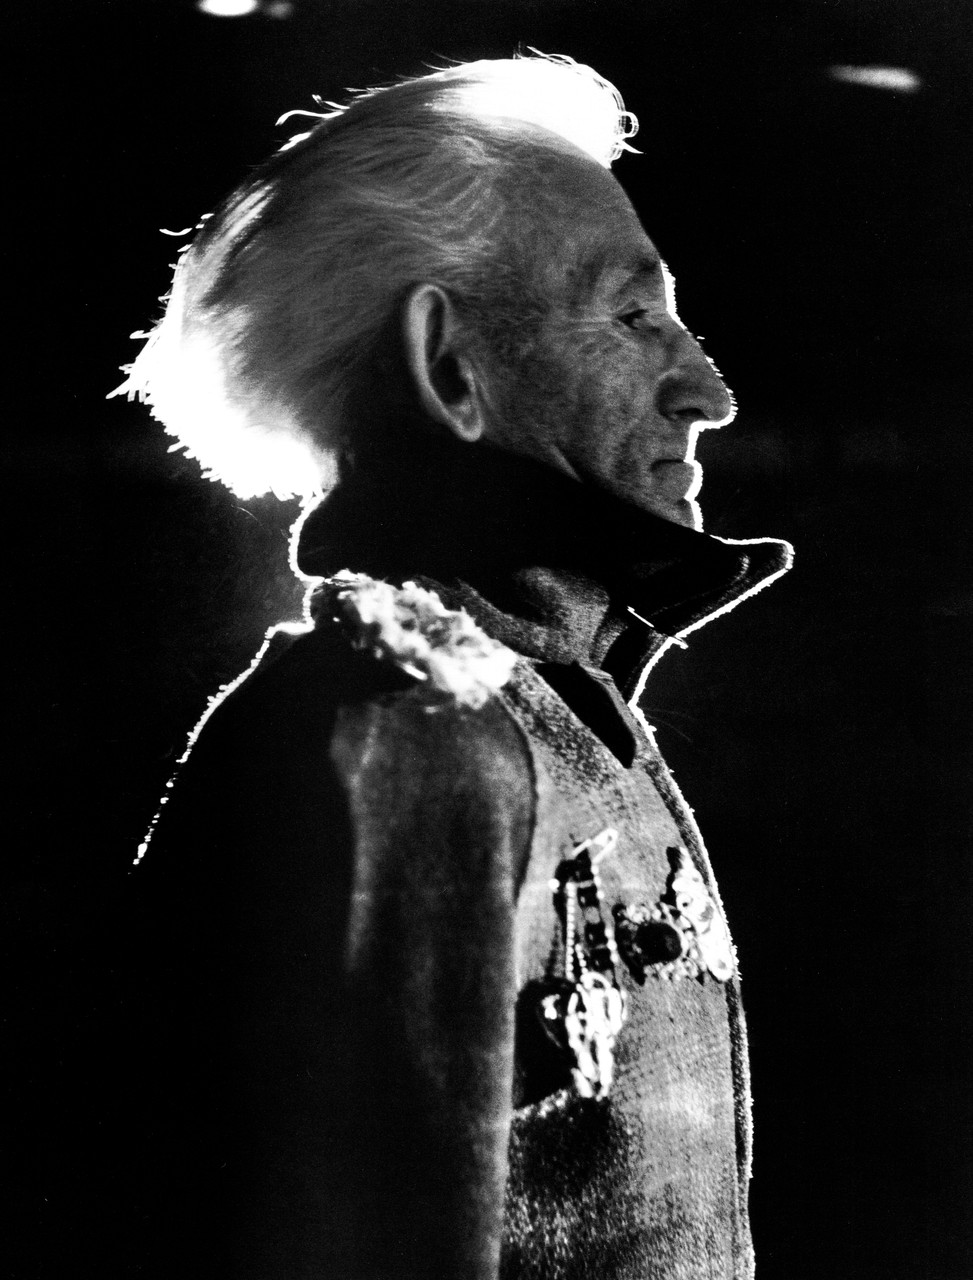 Samuel Rothbort, 1954